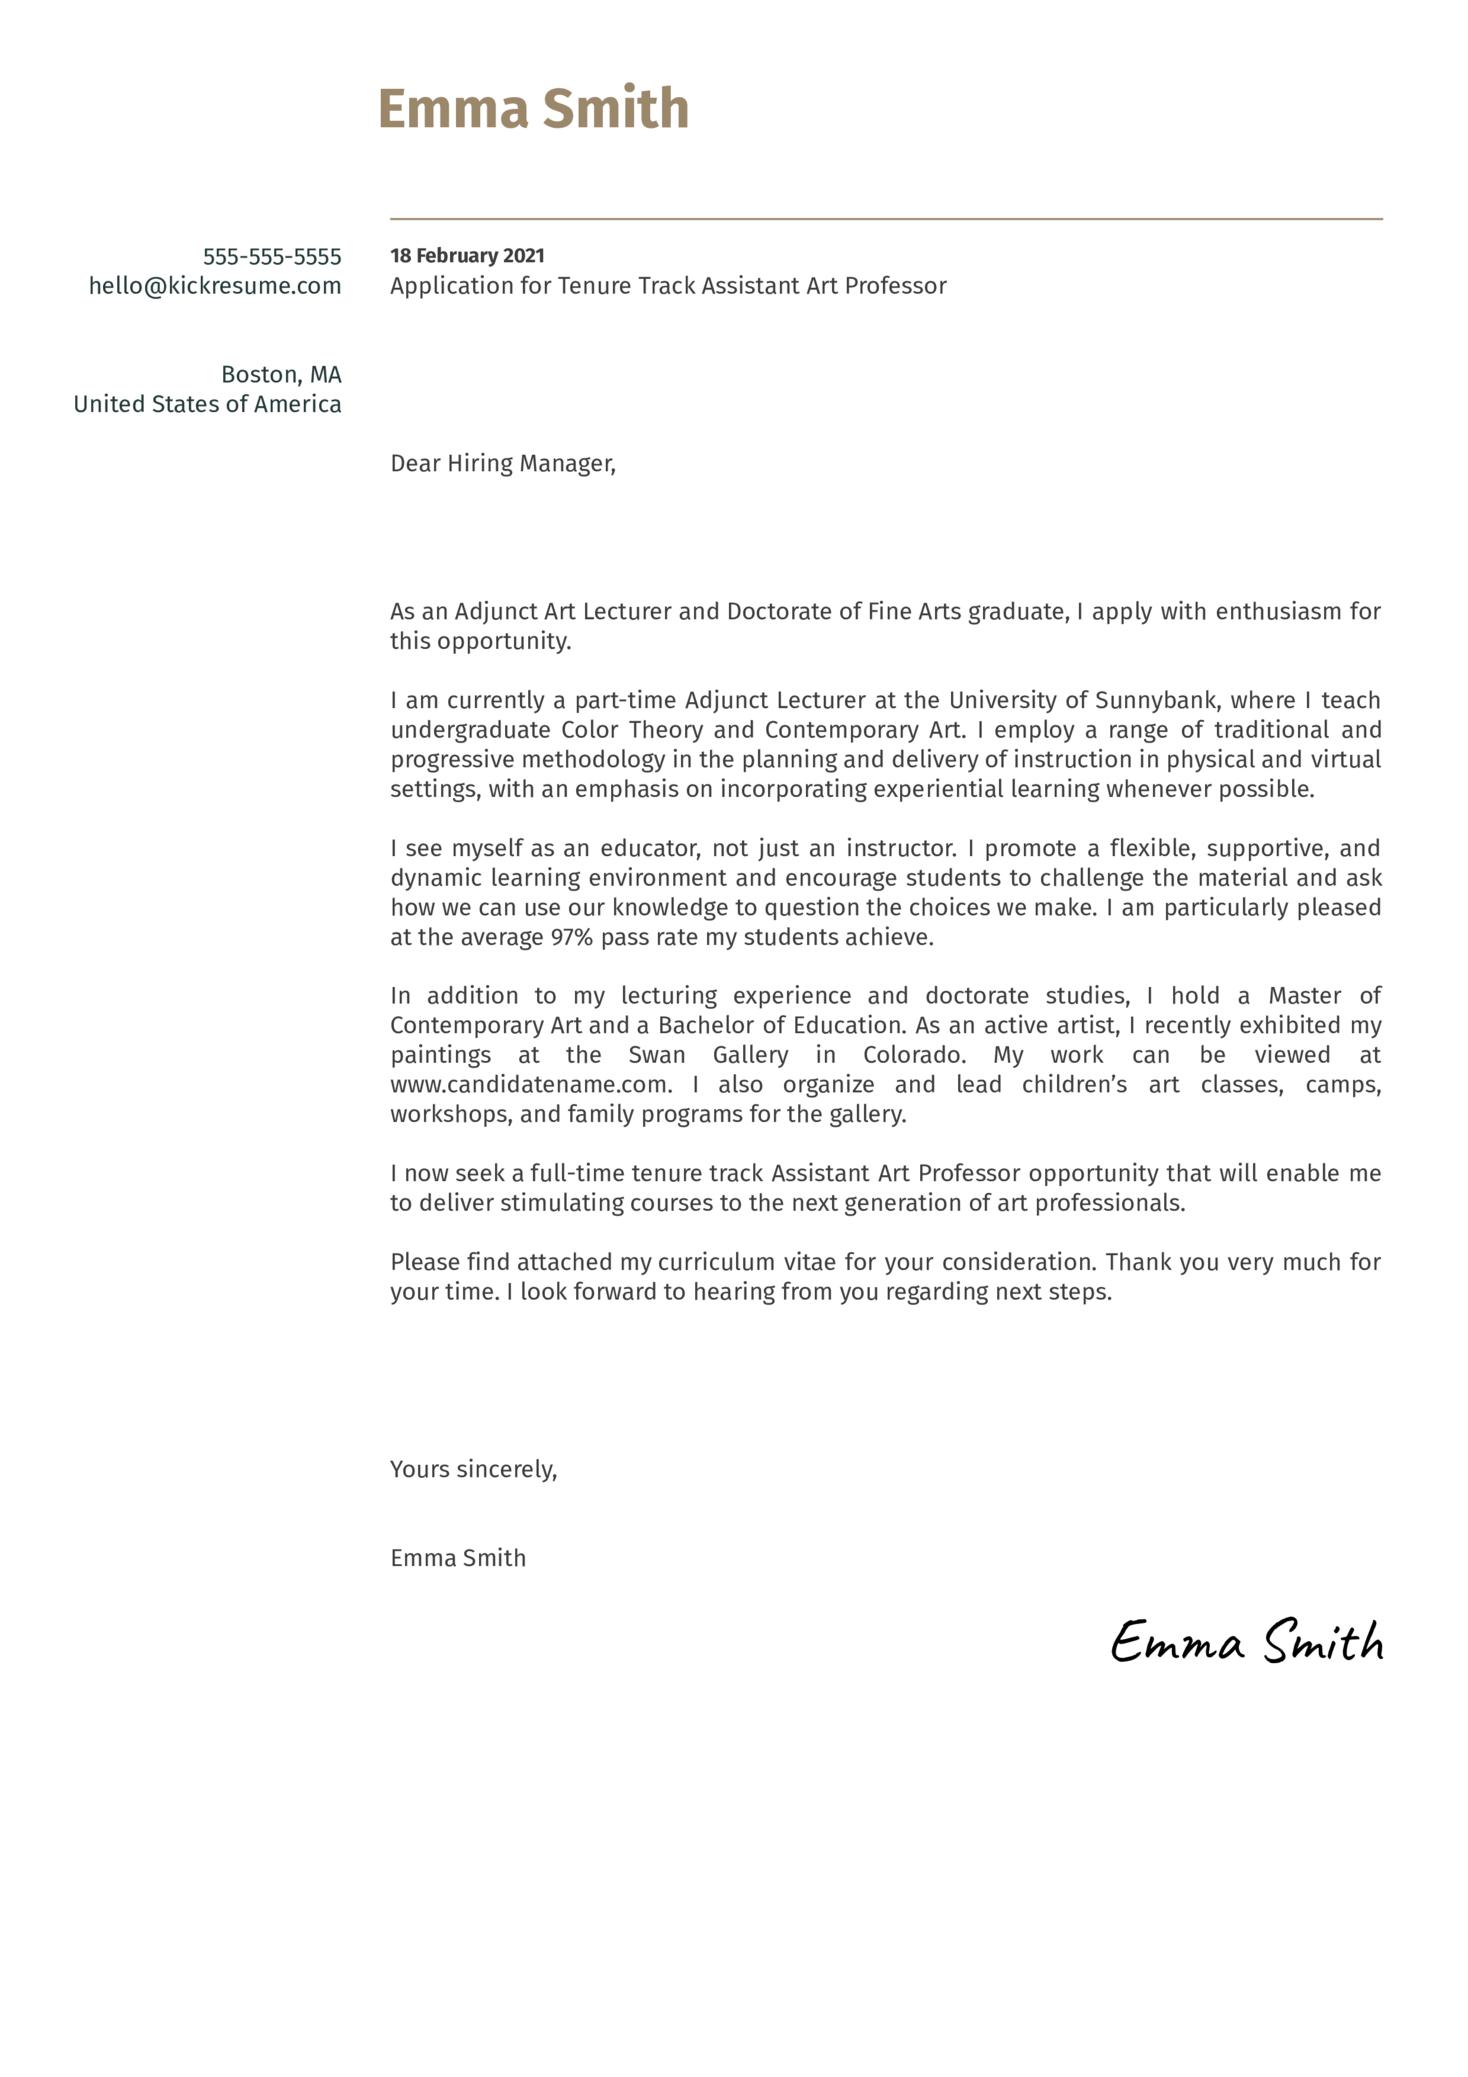 Tenure Track Assistant Art Professor Cover Letter Sample